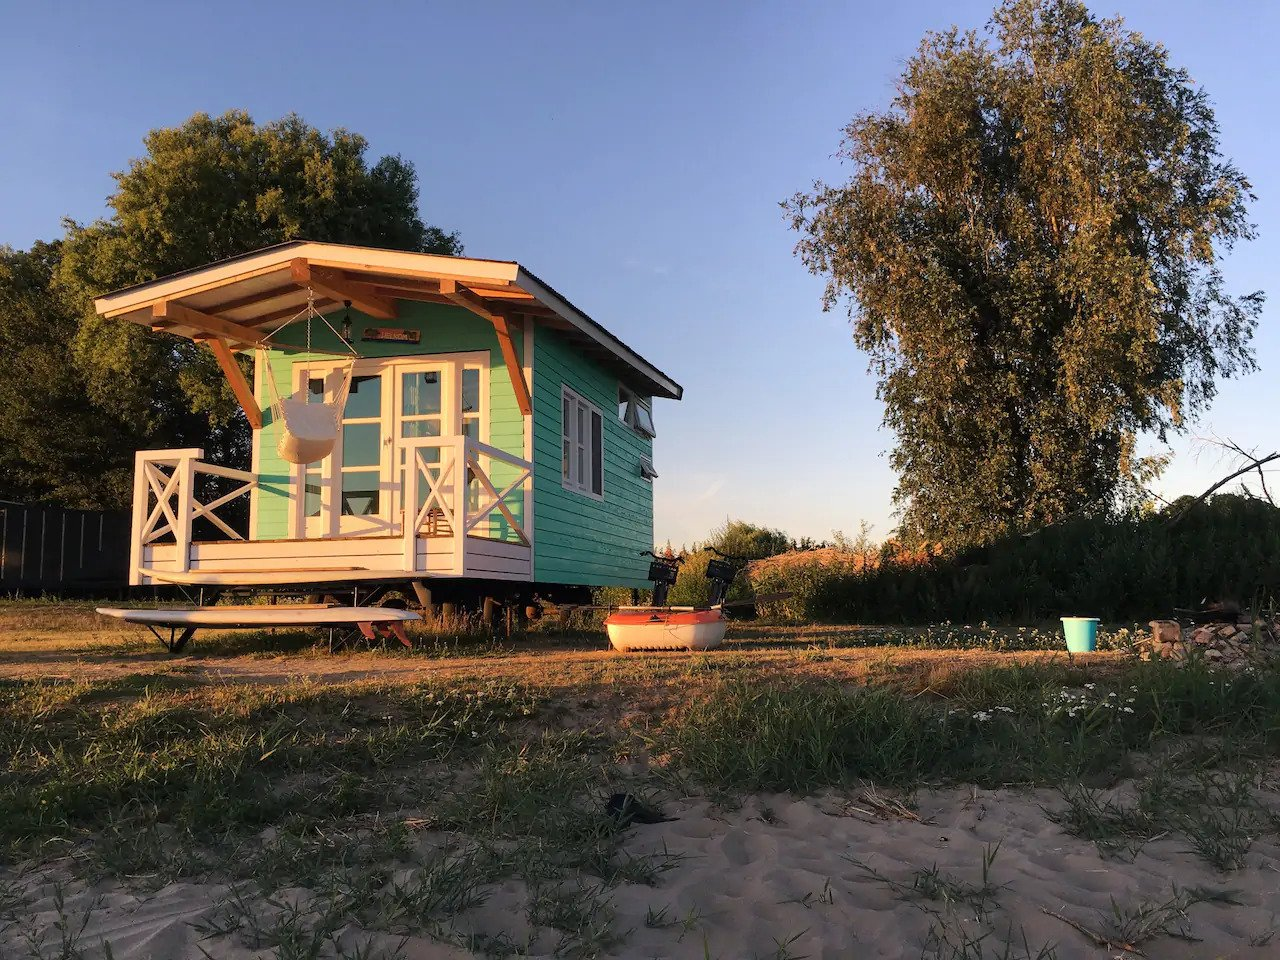 airbnb, tiny house, verborgen parels, nederland, vakantie